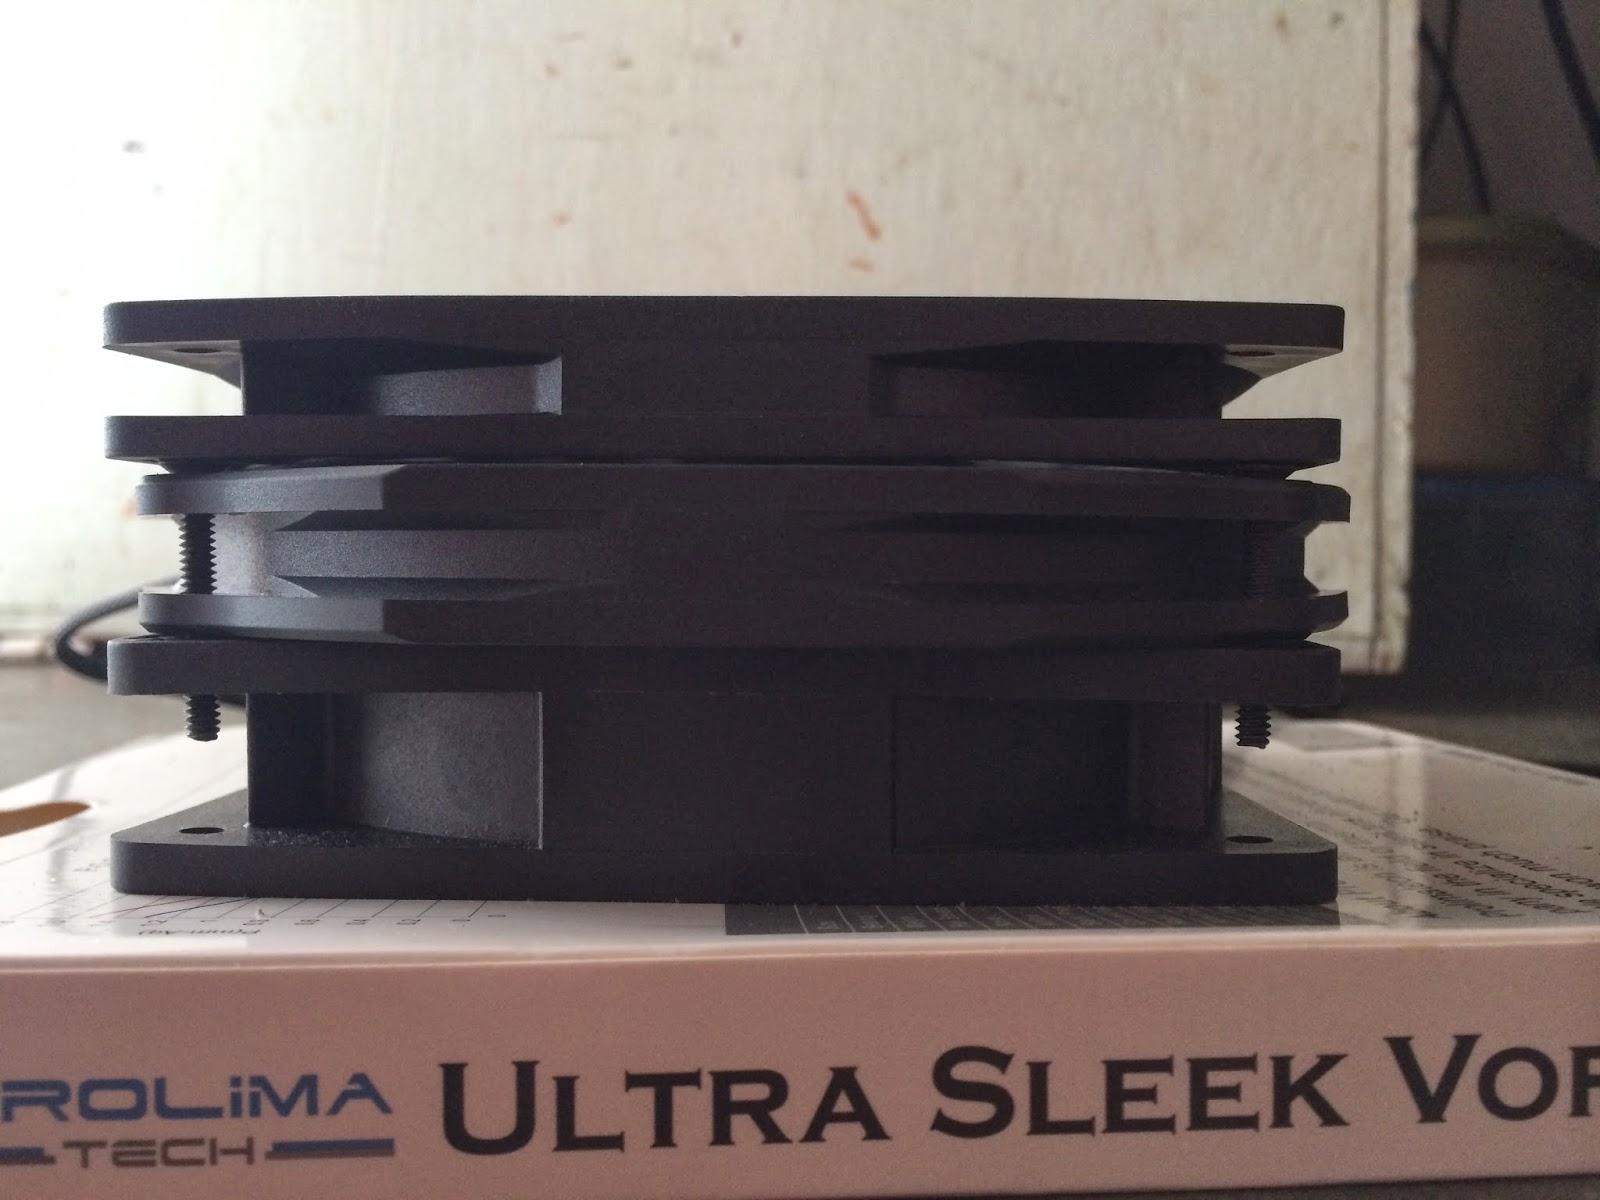 Prolimatech Ultra Sleek Vortex Performance Review 13